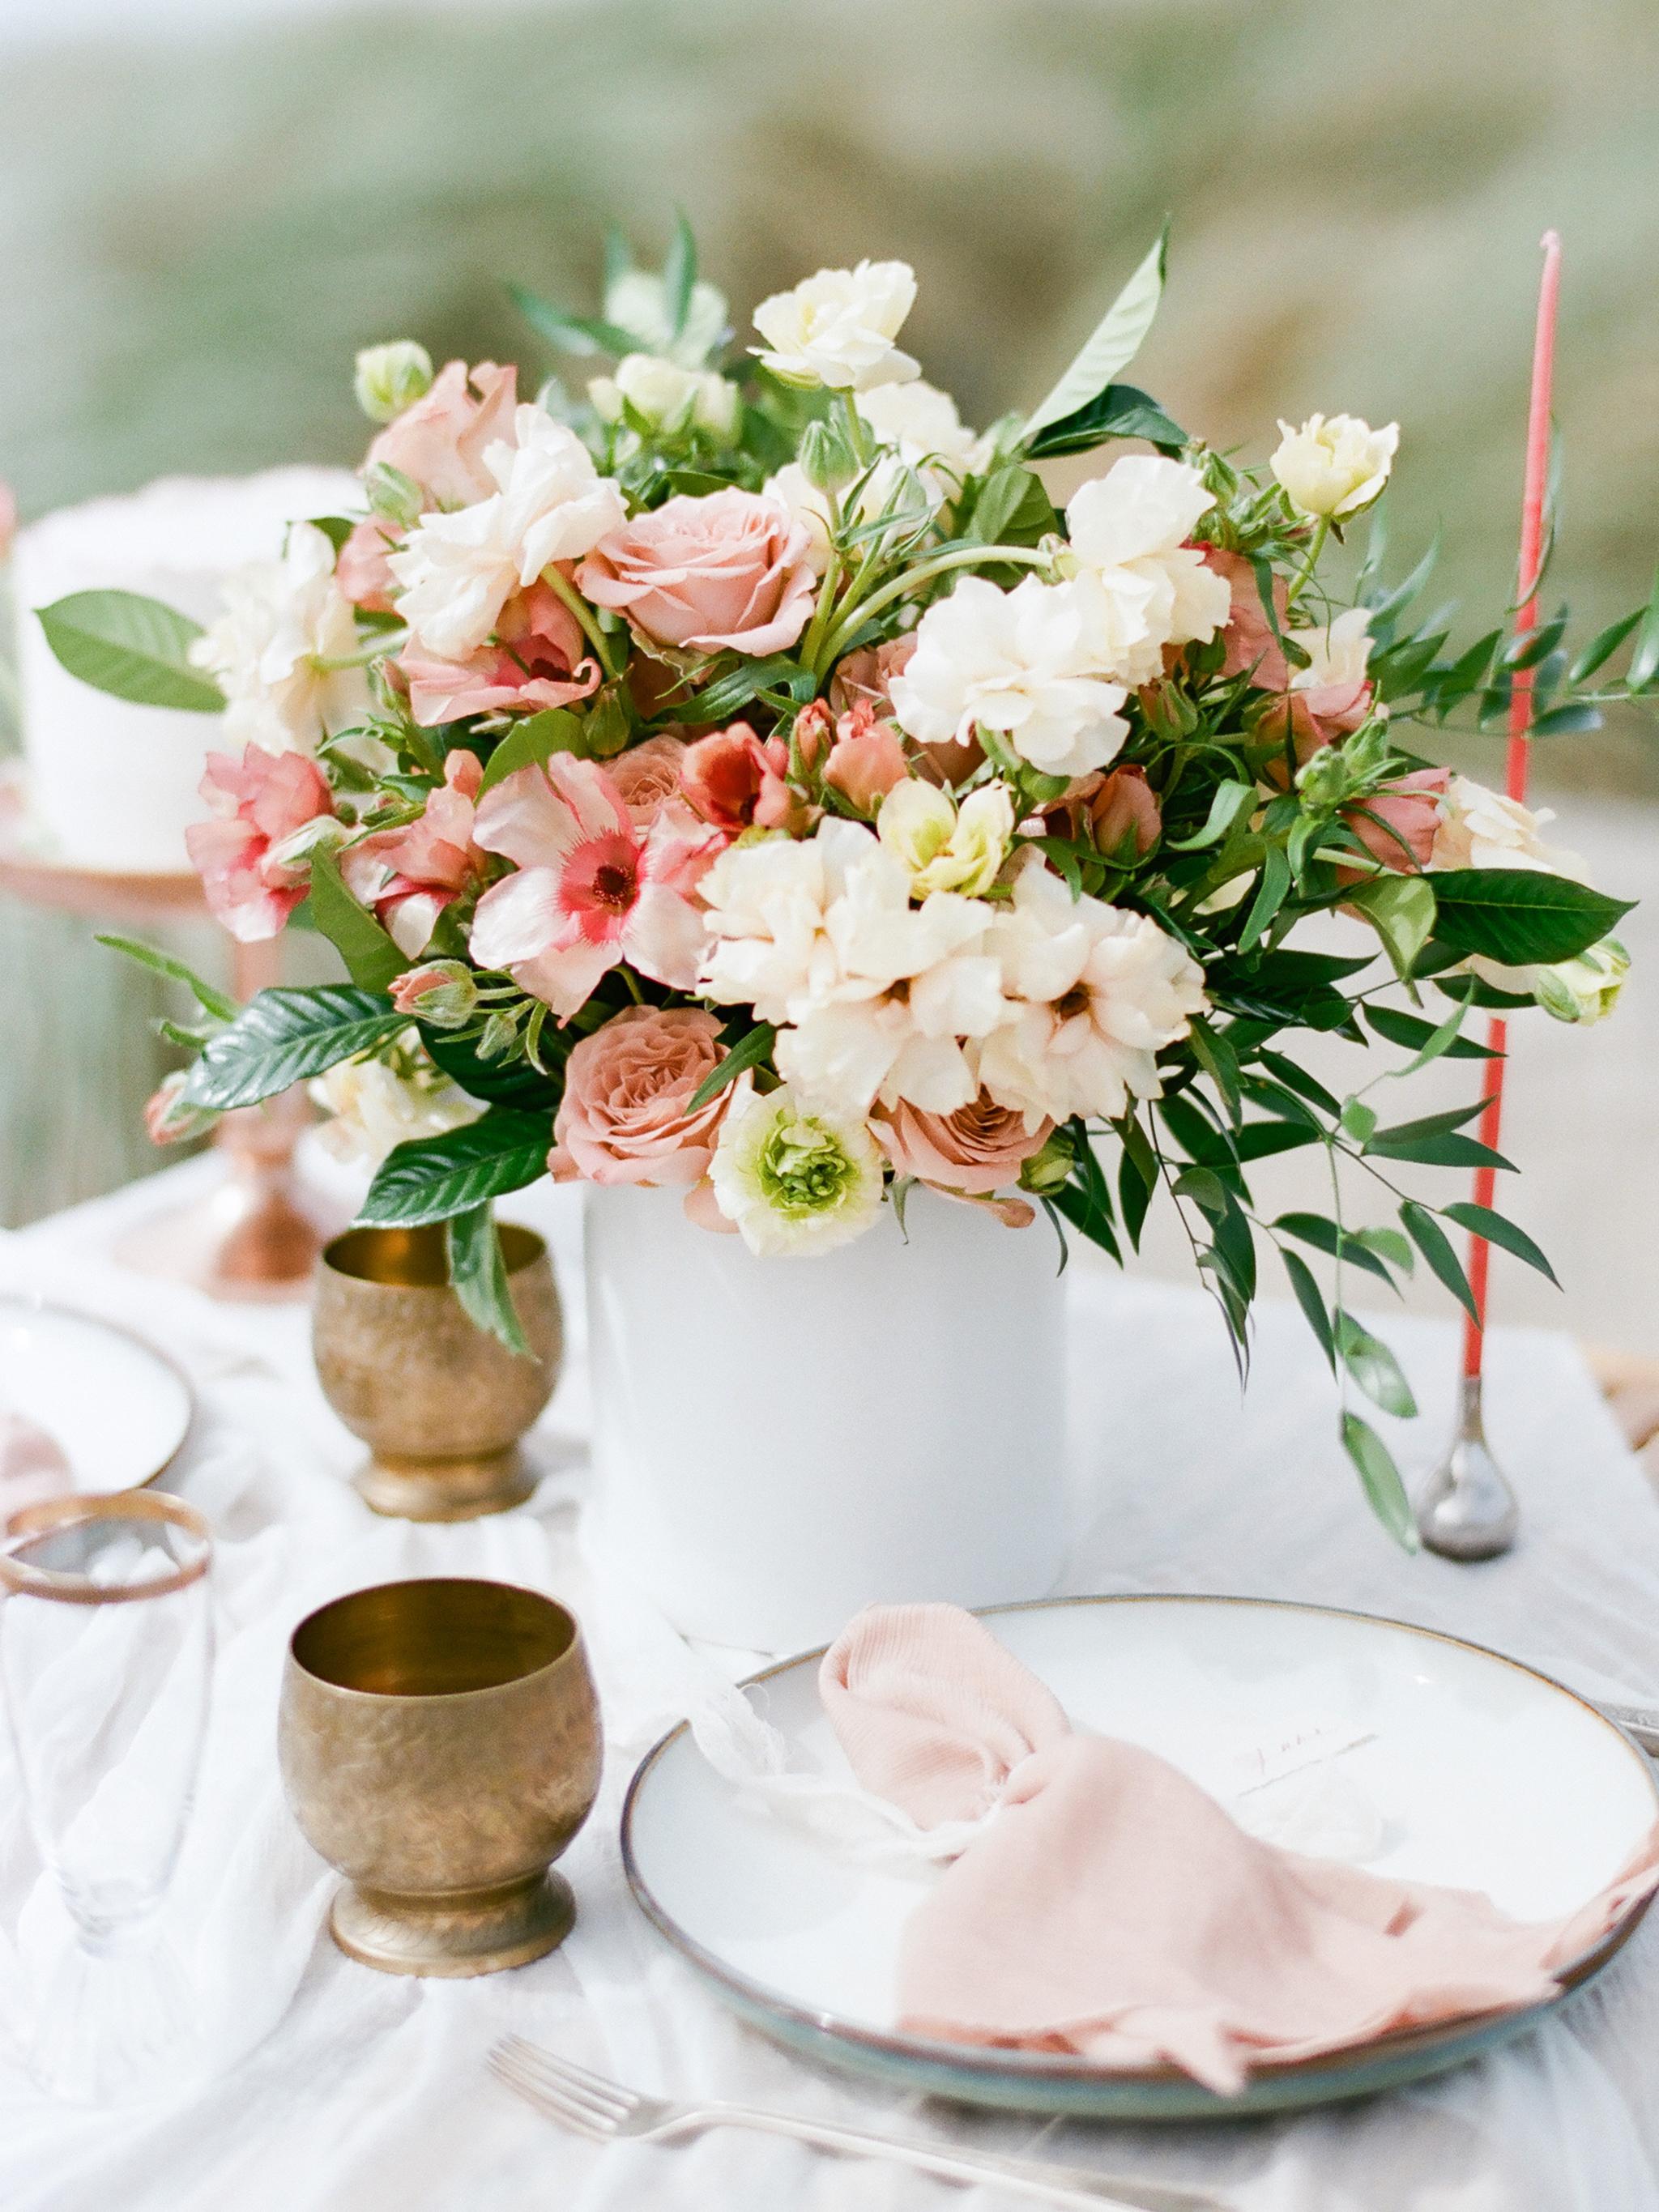 Muave-flowers-wedding-bouquet